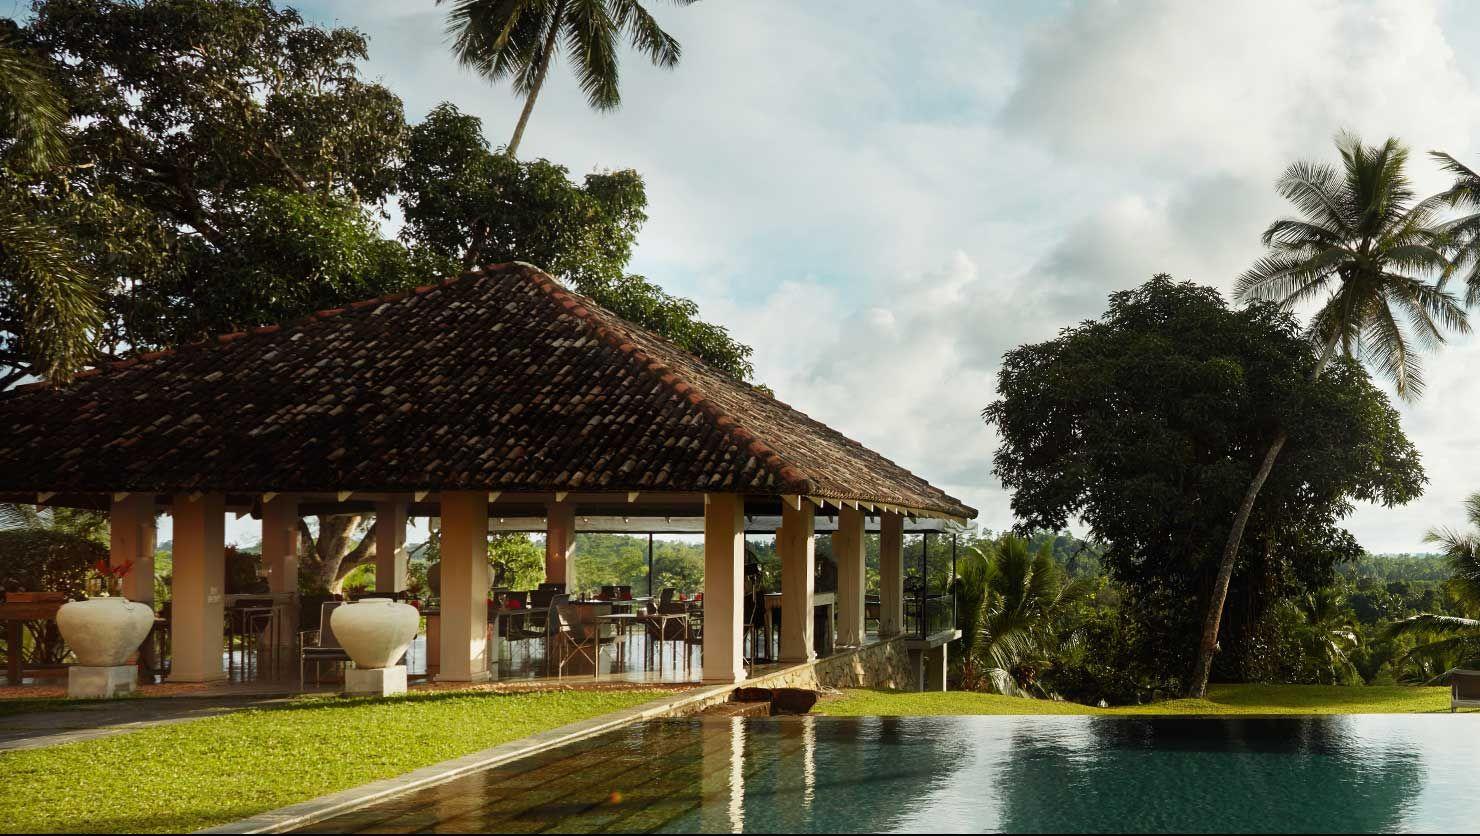 Pin Parasol Distance Maison the vacation report: sri lanka's finest | matchesfashion us